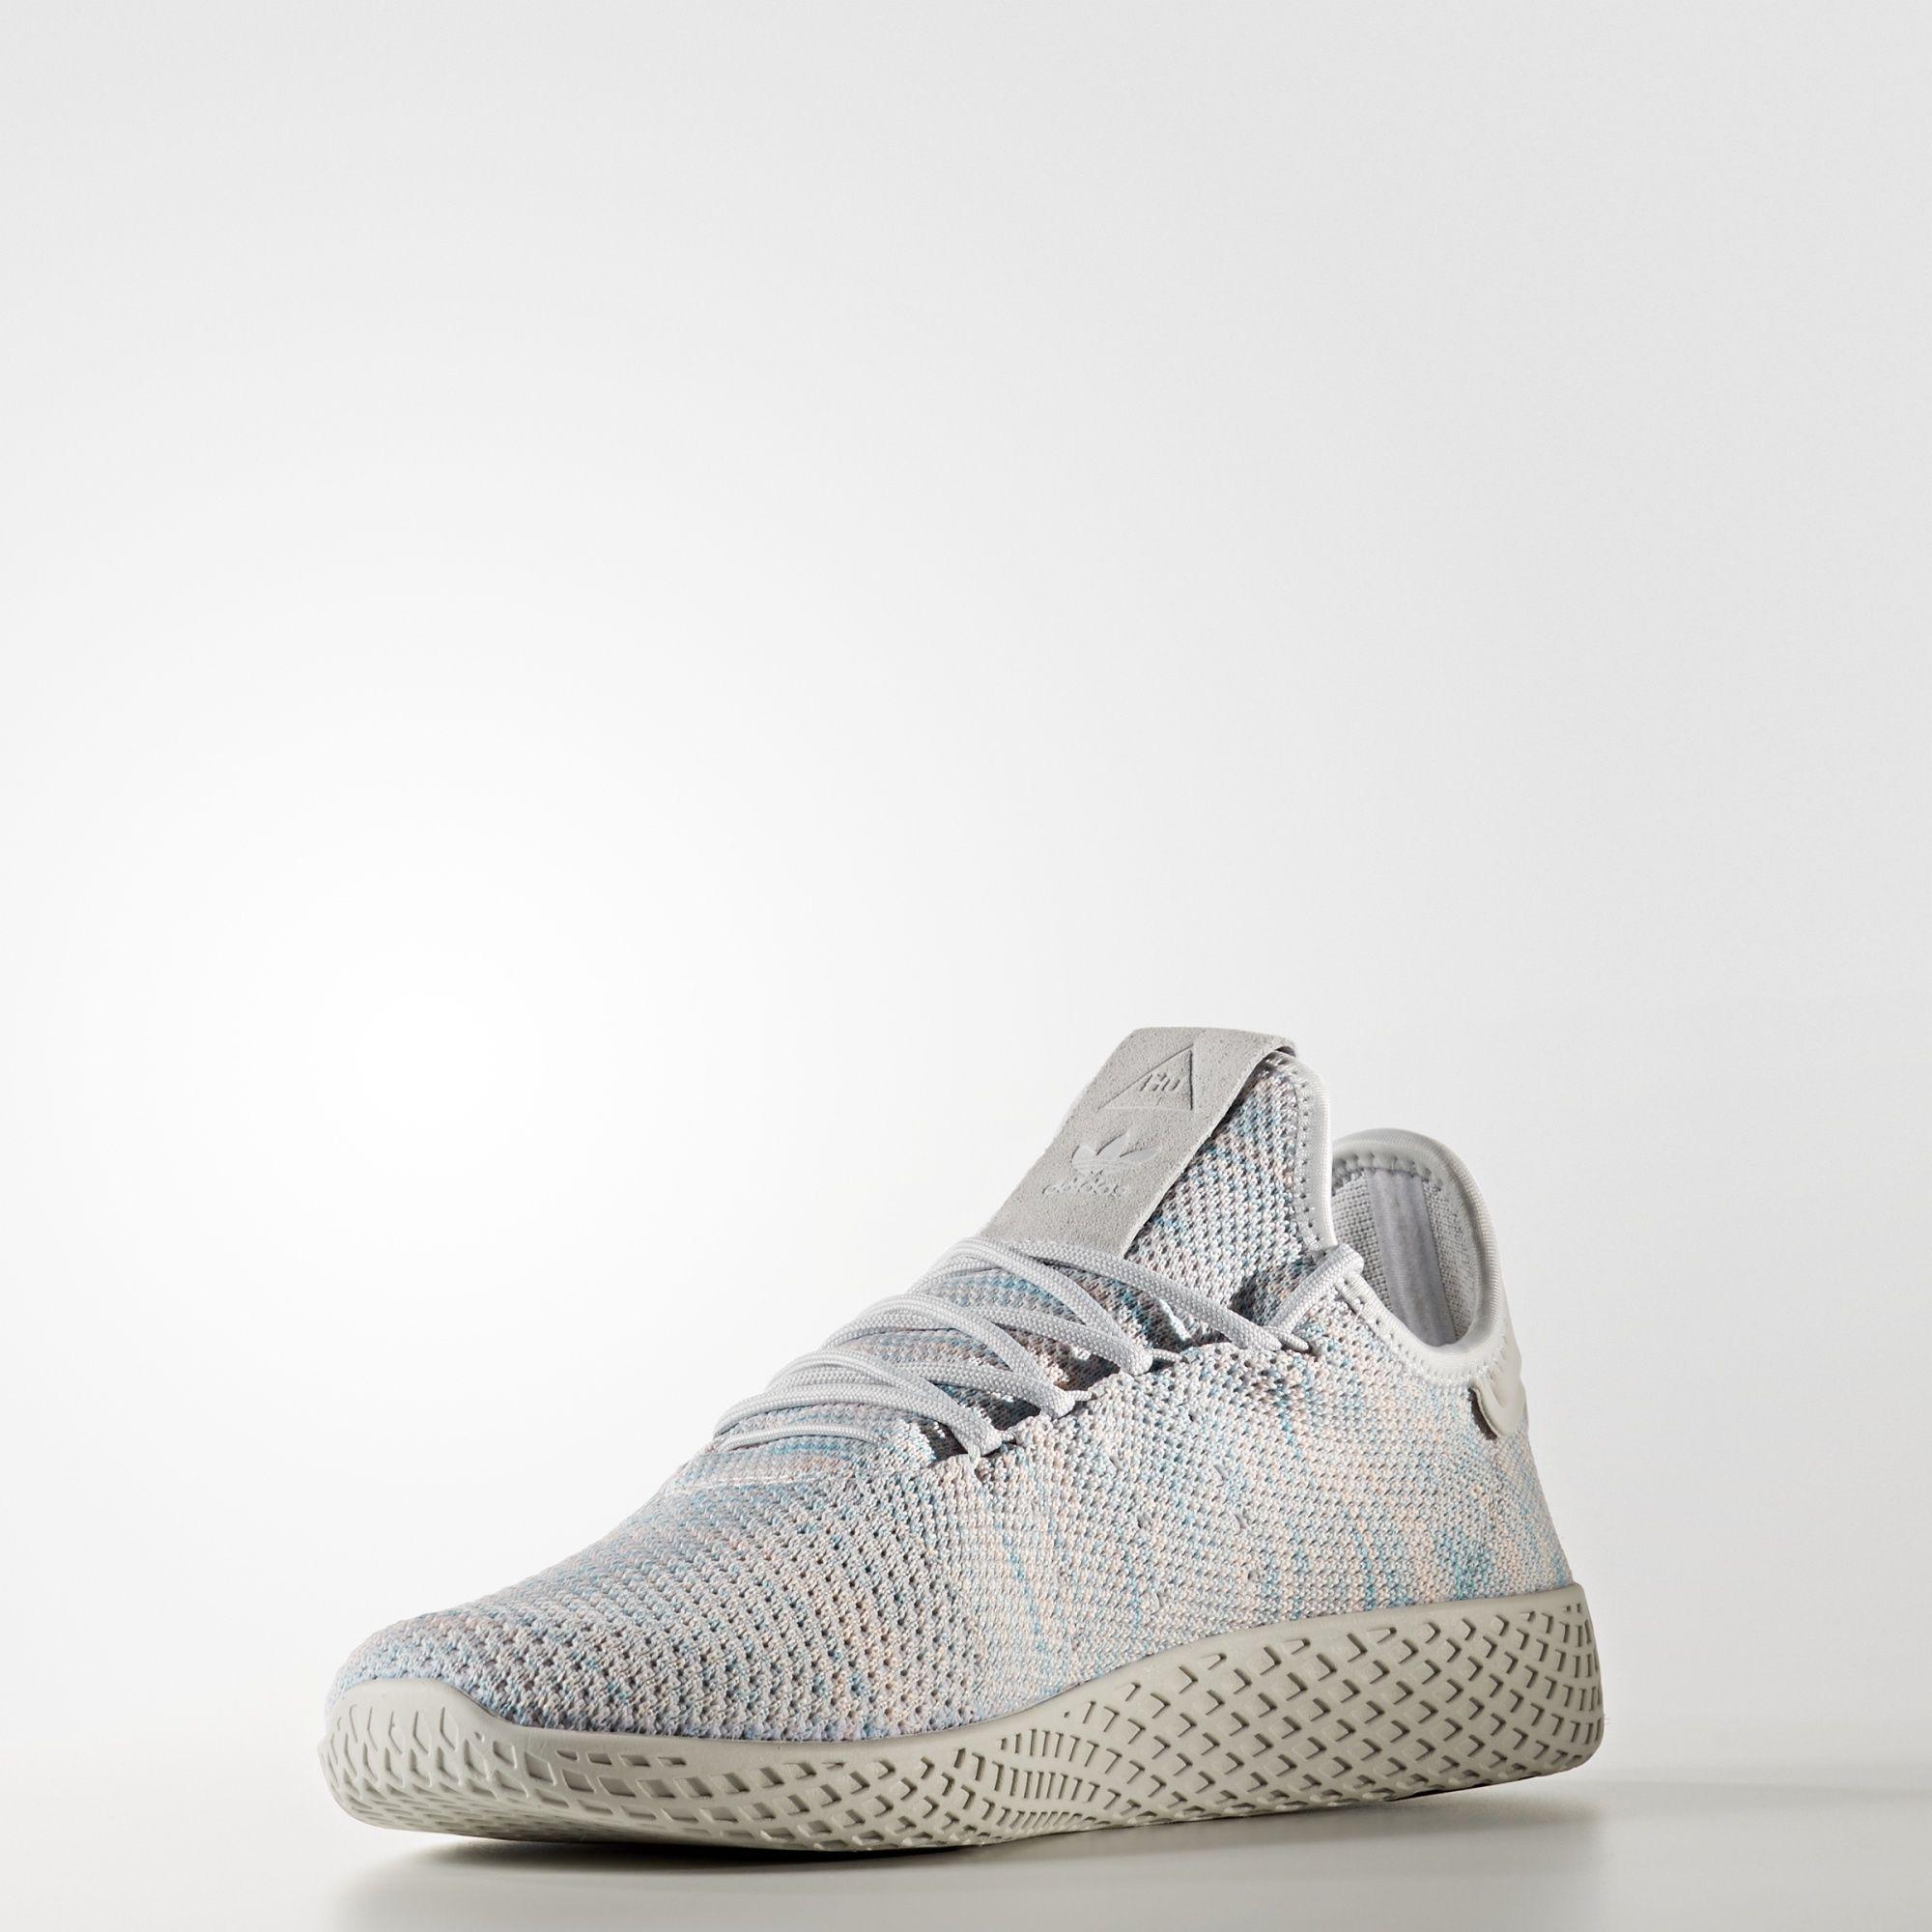 BY2671 Pharrell Williams x adidas Tennis HU Semi Frozen Yellow 2